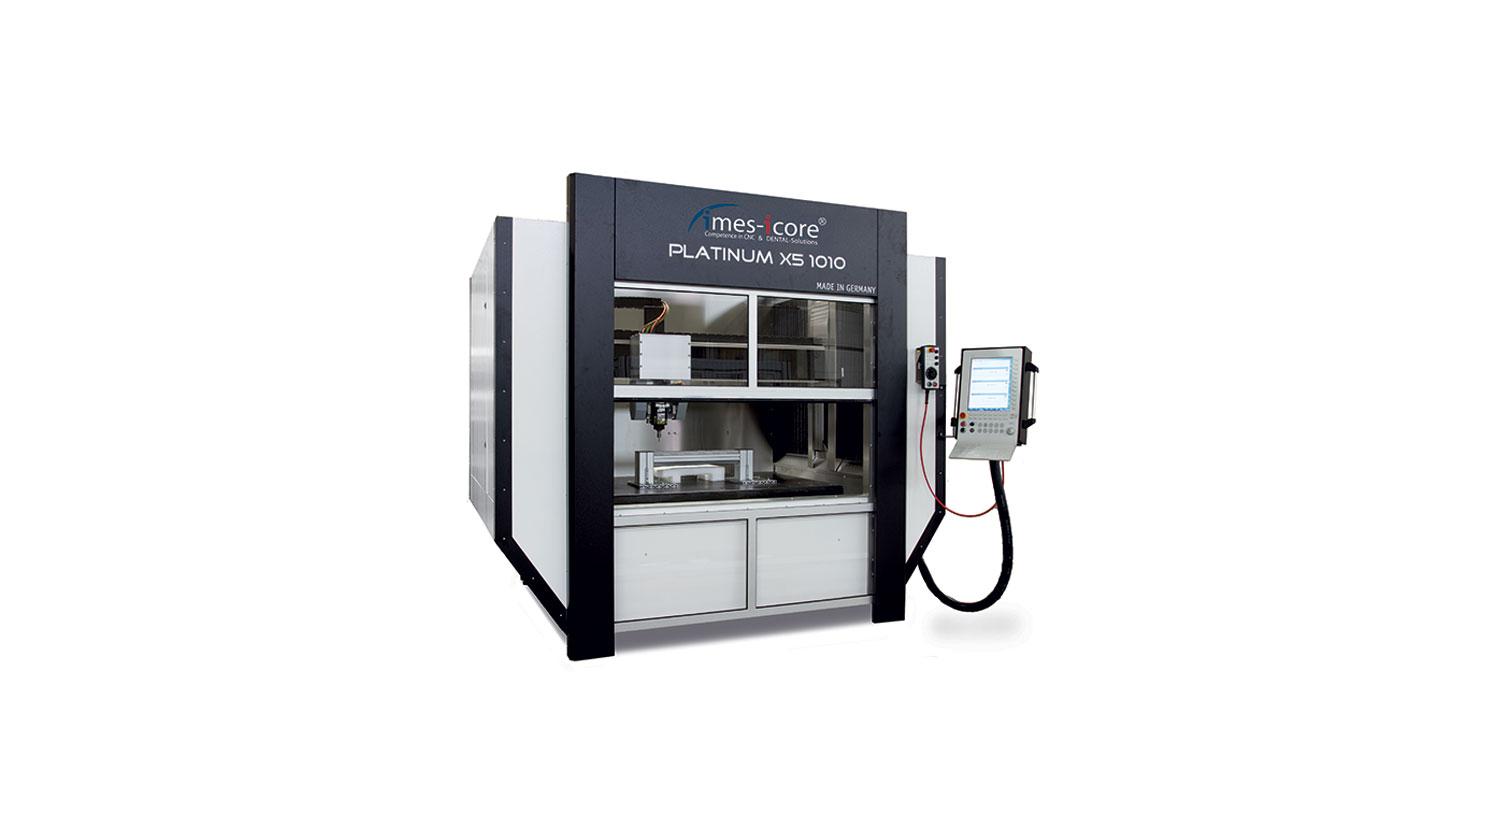 INT micro milling rapid prototyping CNC Imes Icore Platinum X5